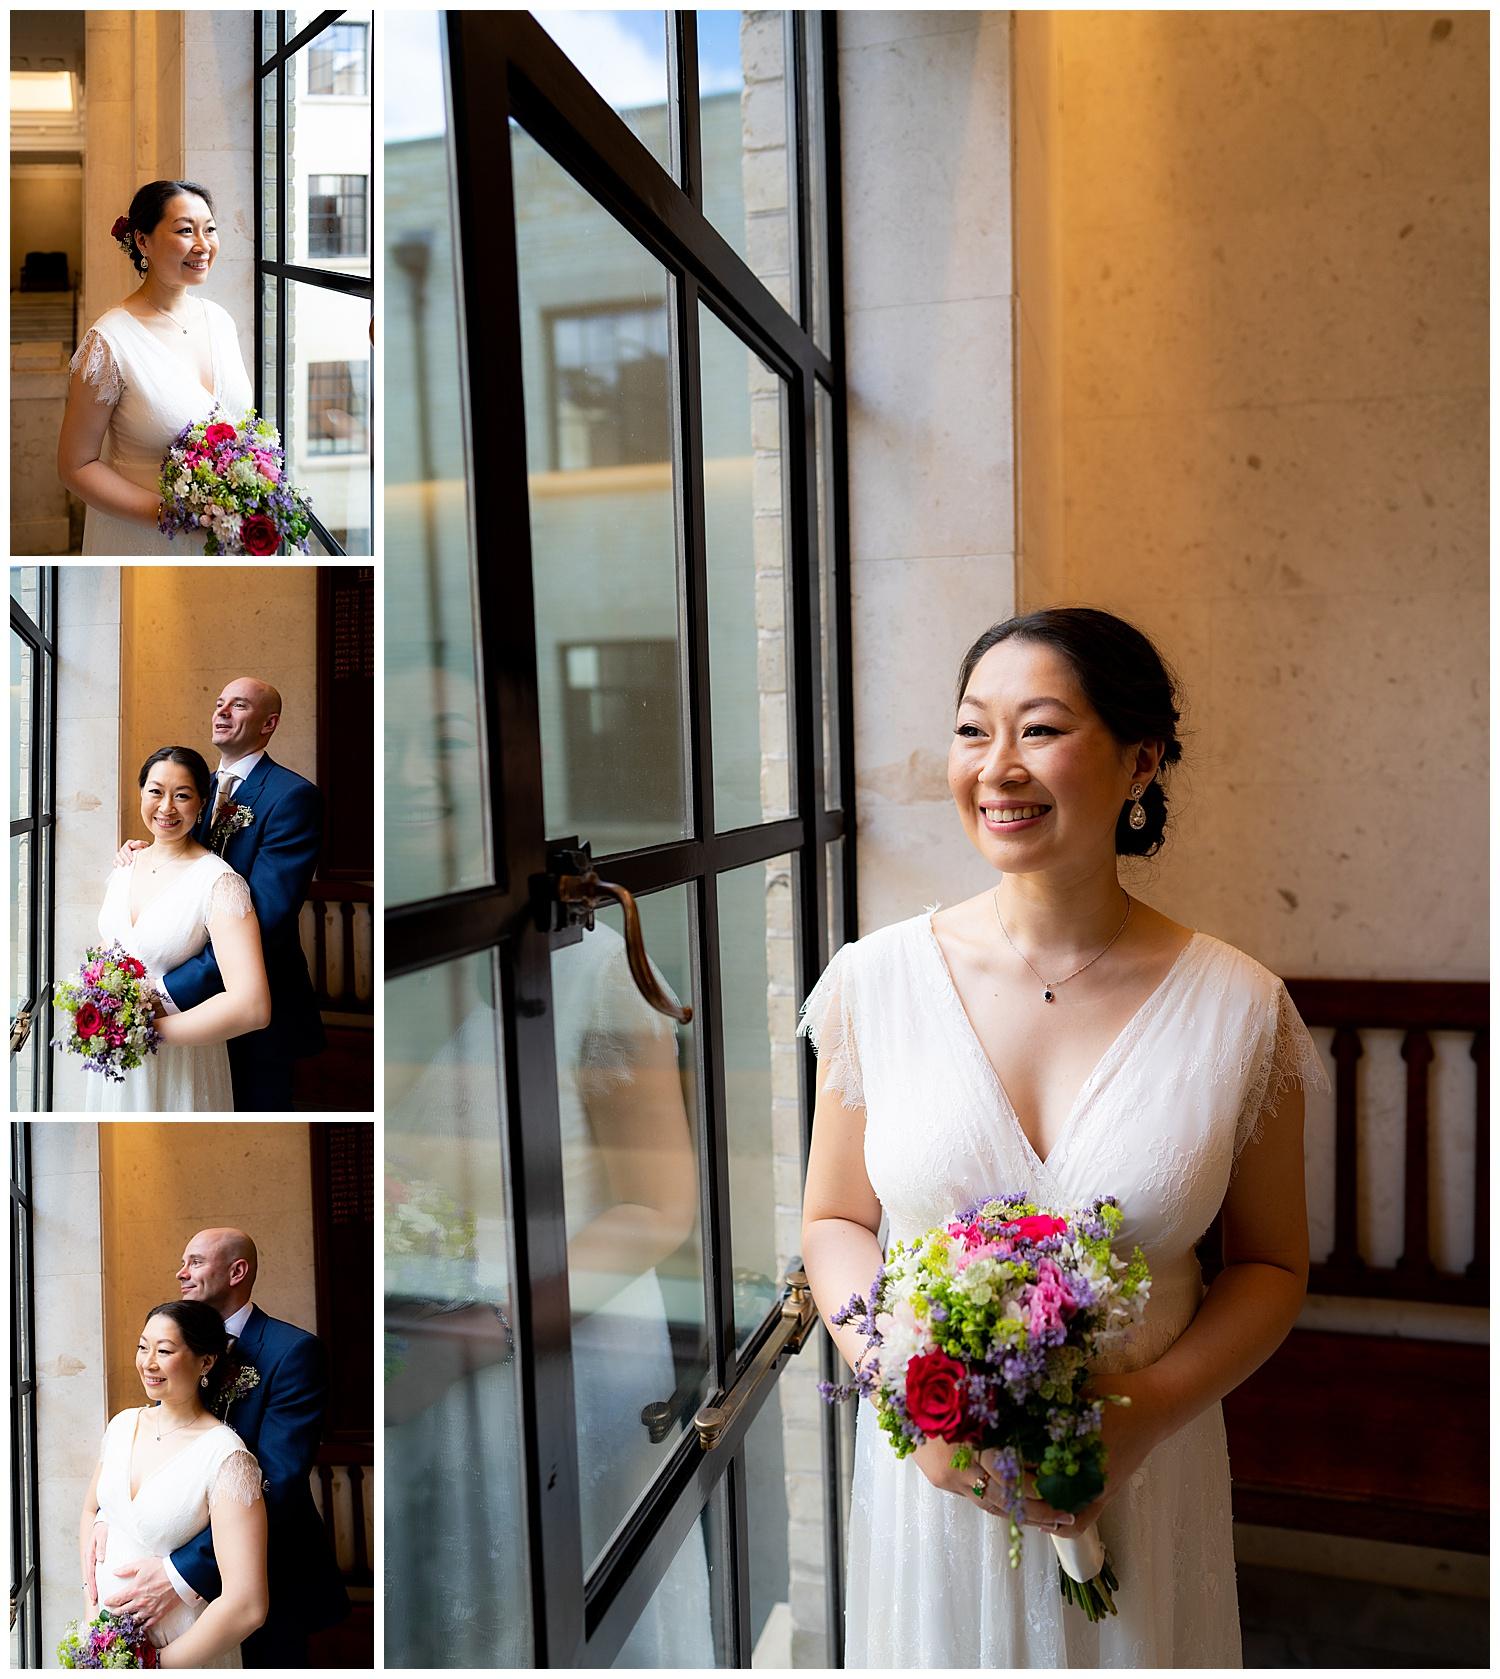 marylebone-town-hall-wedding-18.jpg